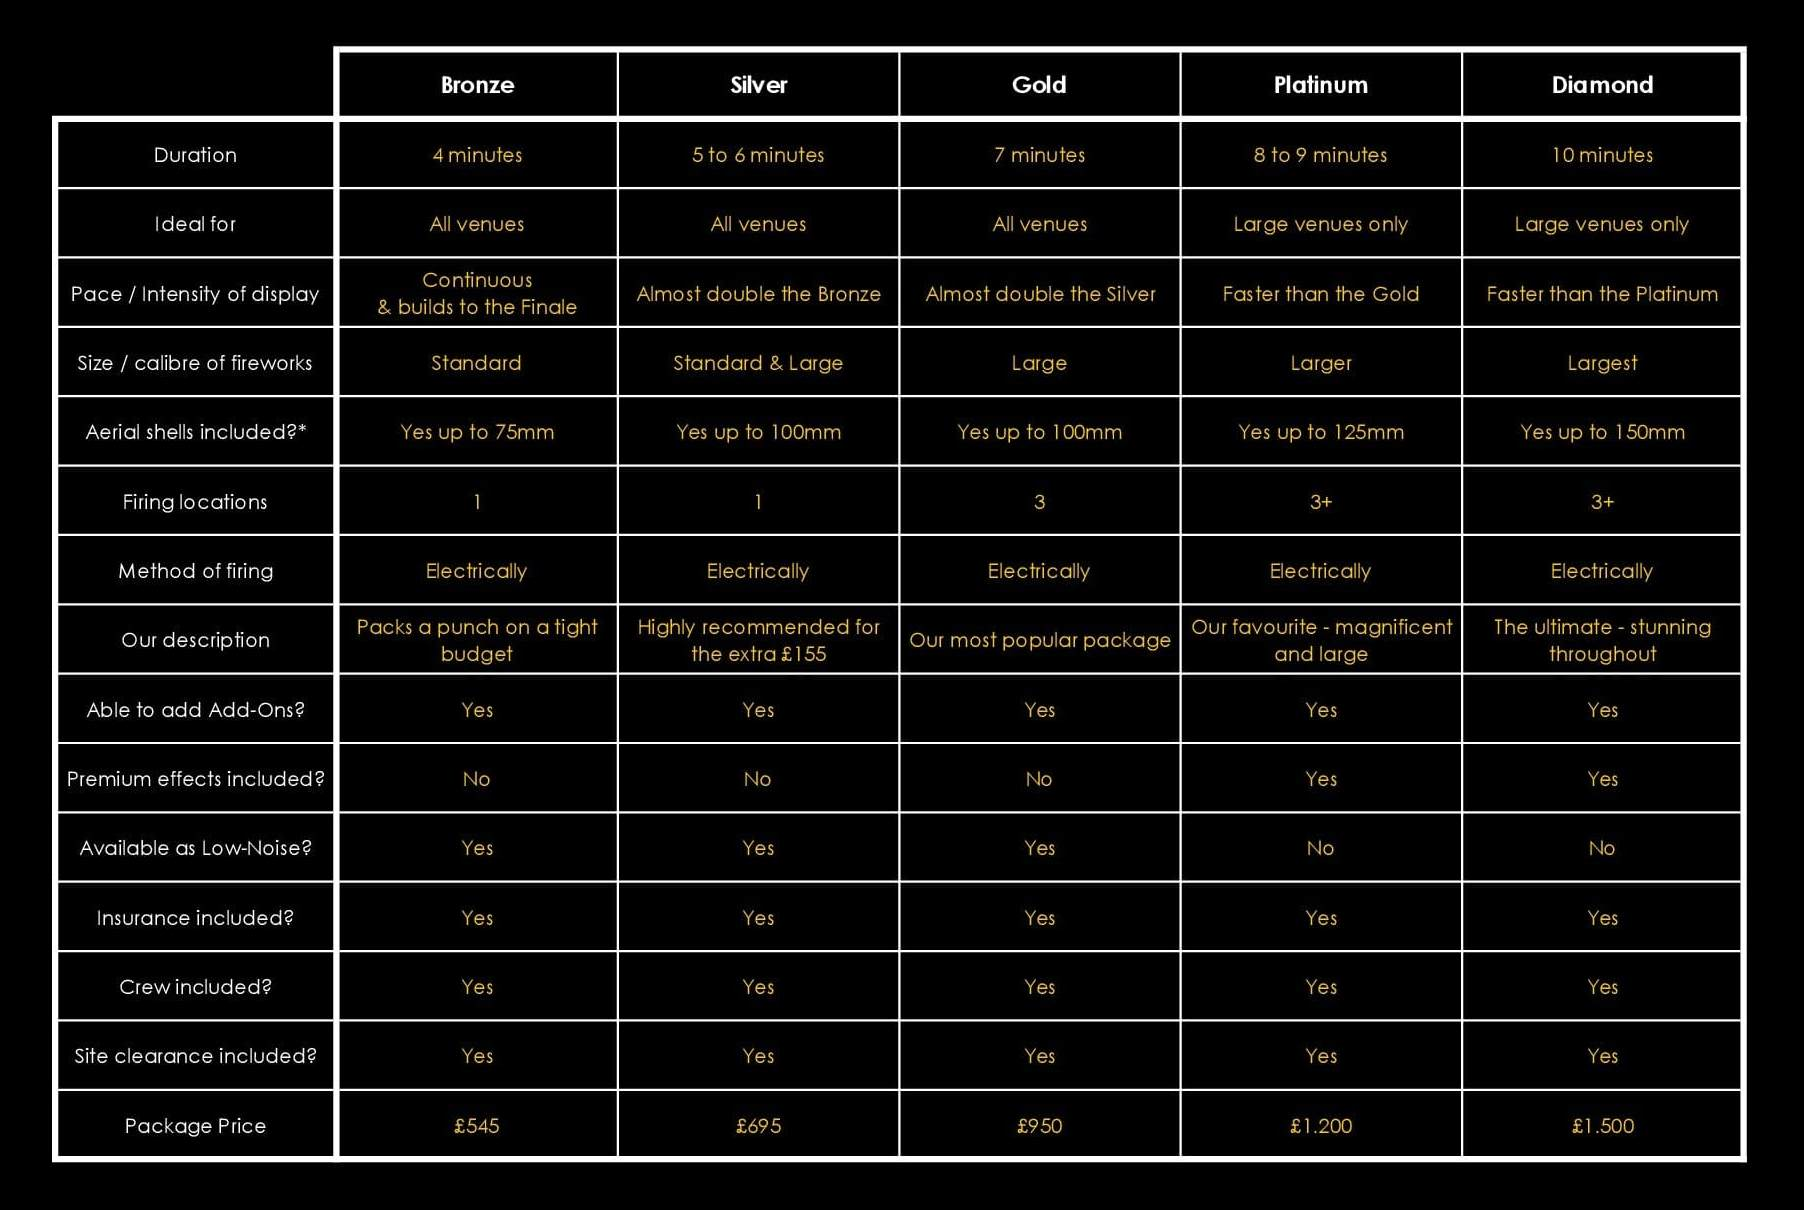 Packages Comparison Table